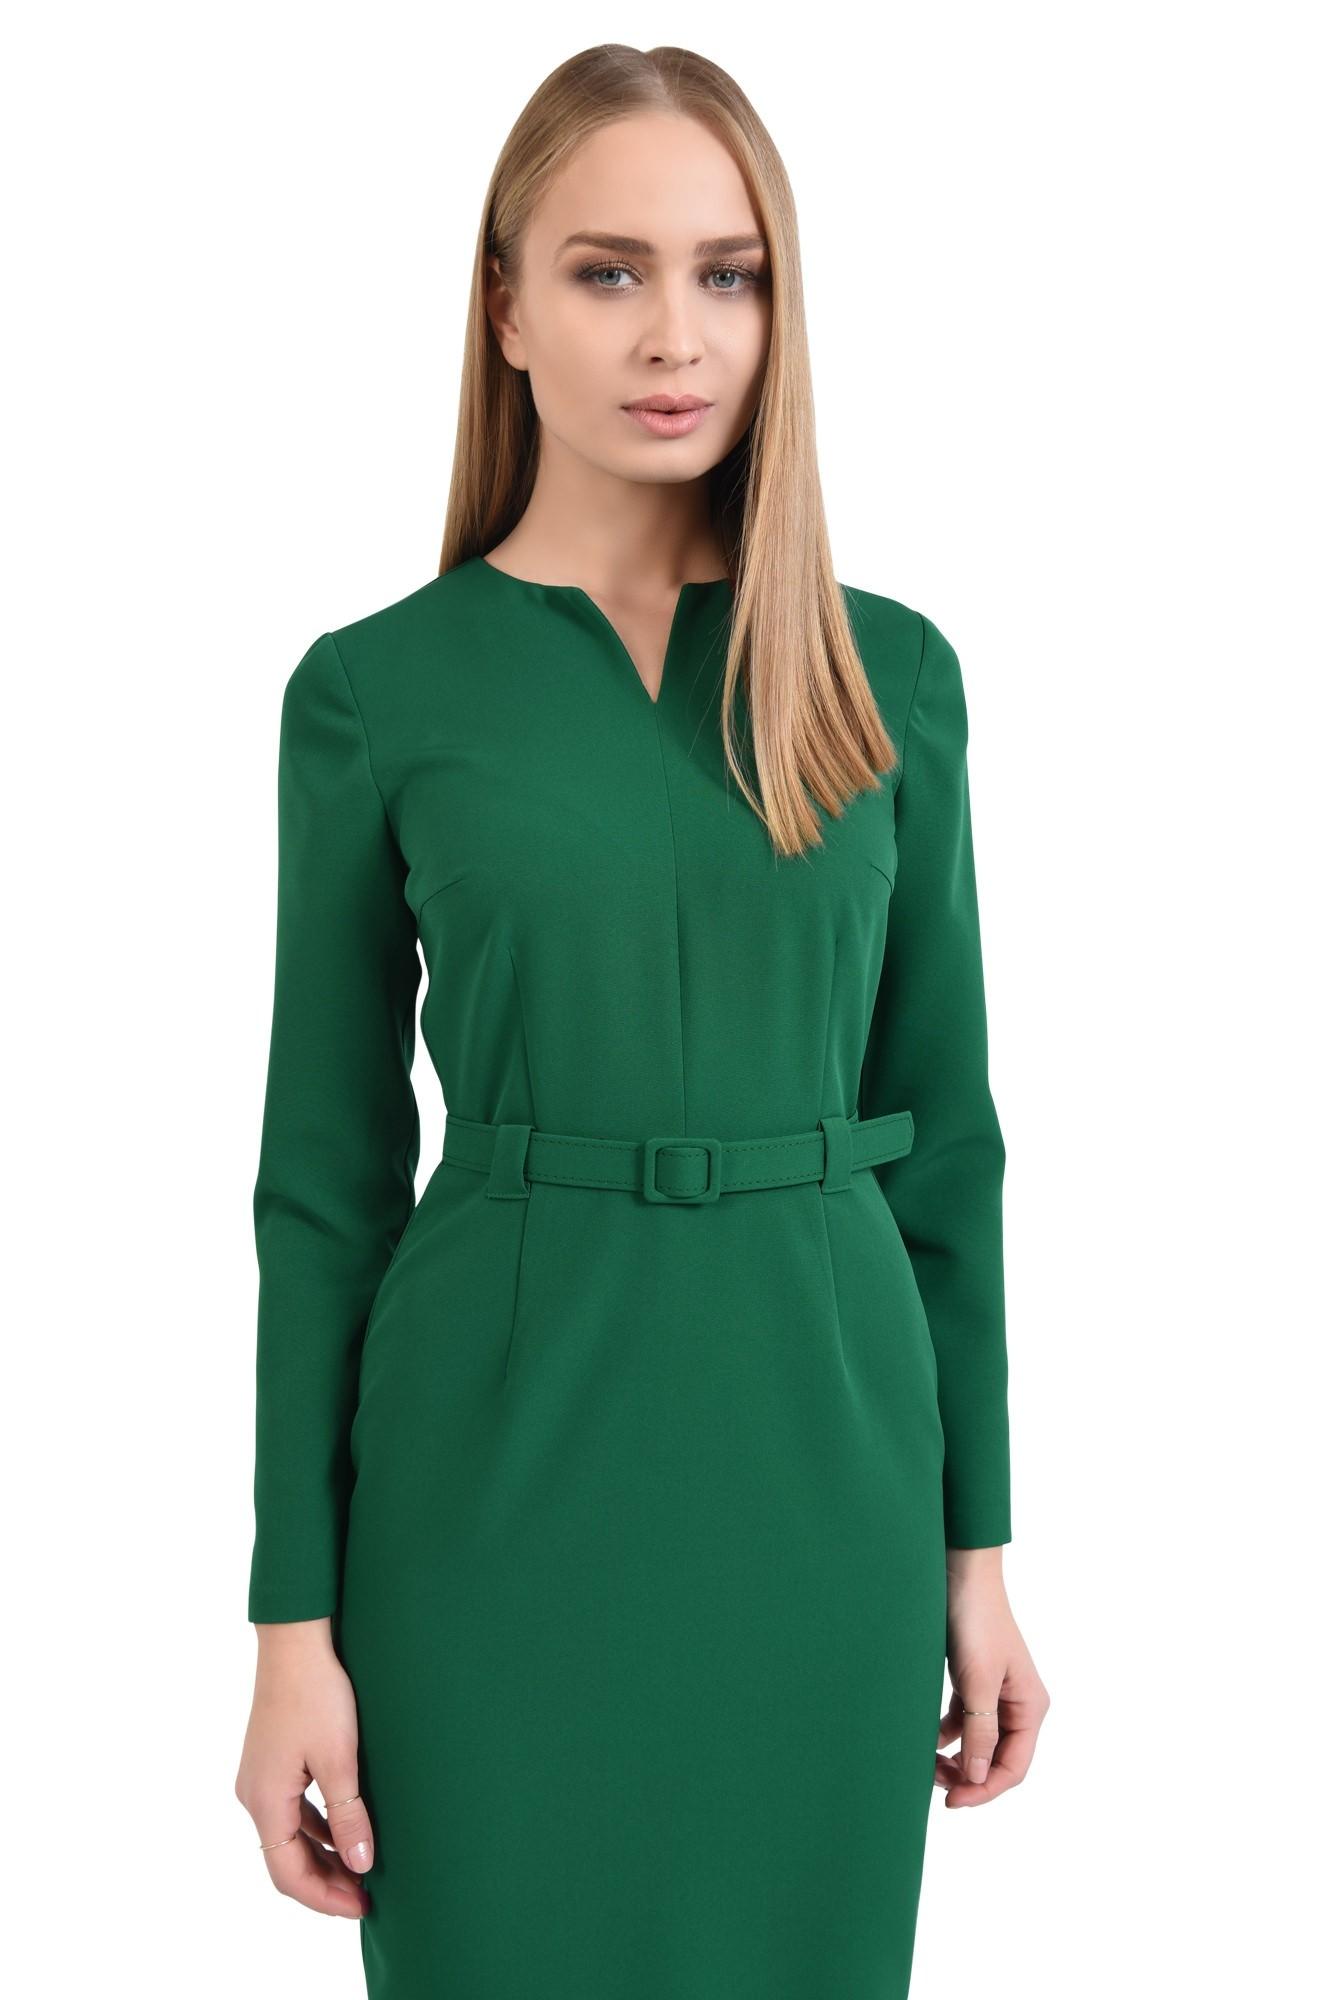 2 - rochie casual, midi, maneci lungi, centura ingusta, verde